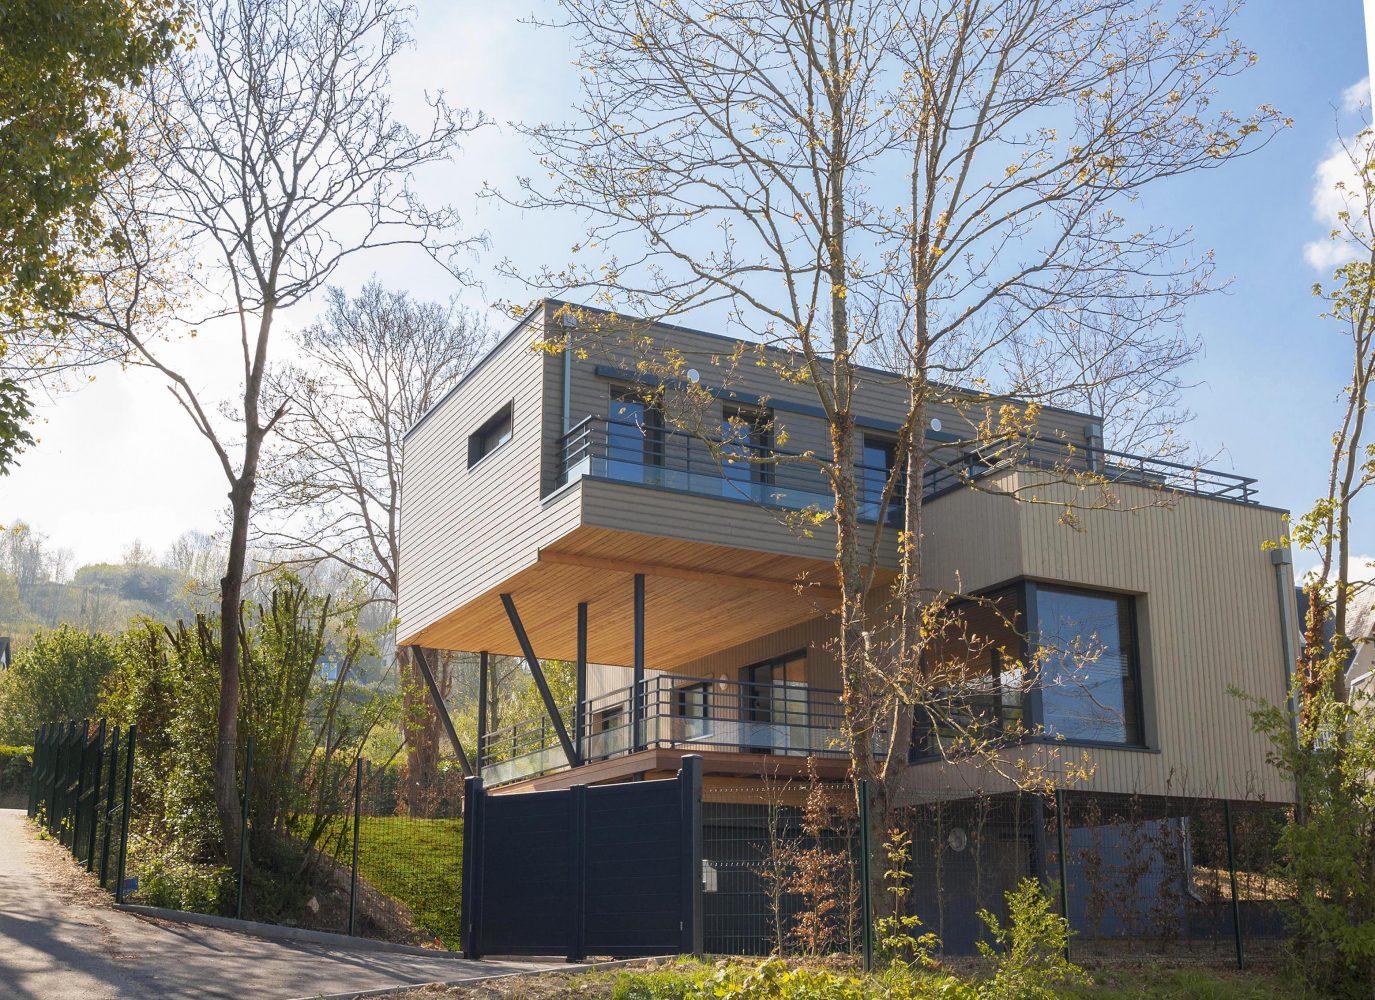 Philippe_Zerbib_Architecte_construction_maisons_ossature_bois_projet_maison_benhamou_MG_8474.jpg